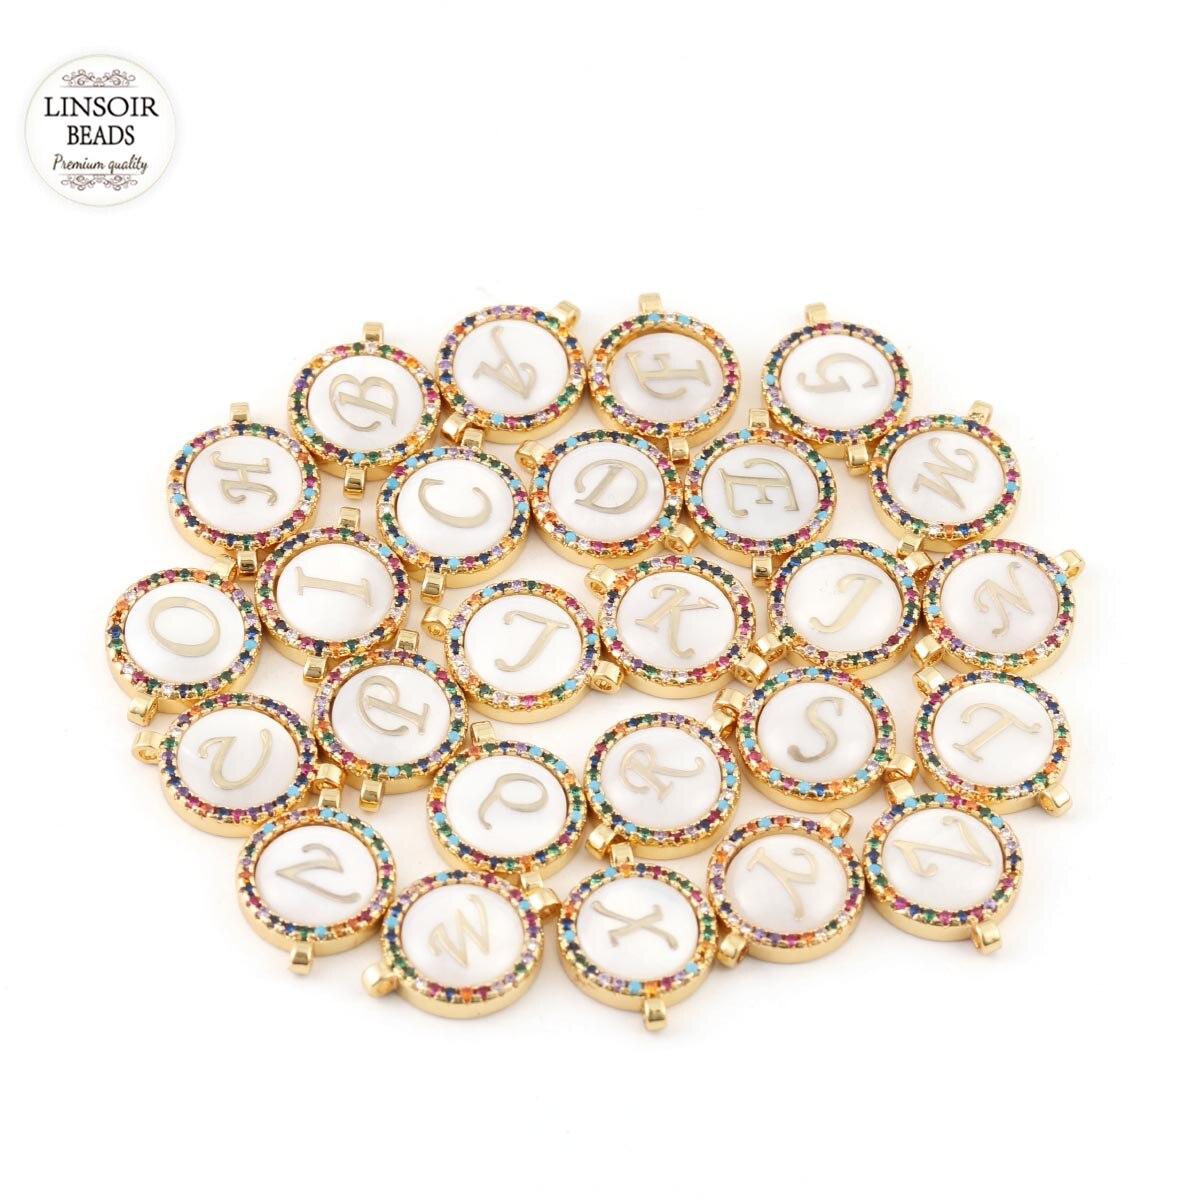 2 pçs/lote cobre encantos incrustados colorido zircônio duplo pendurado pingentes para diy pulseira jóias fazendo 26 letras opcional